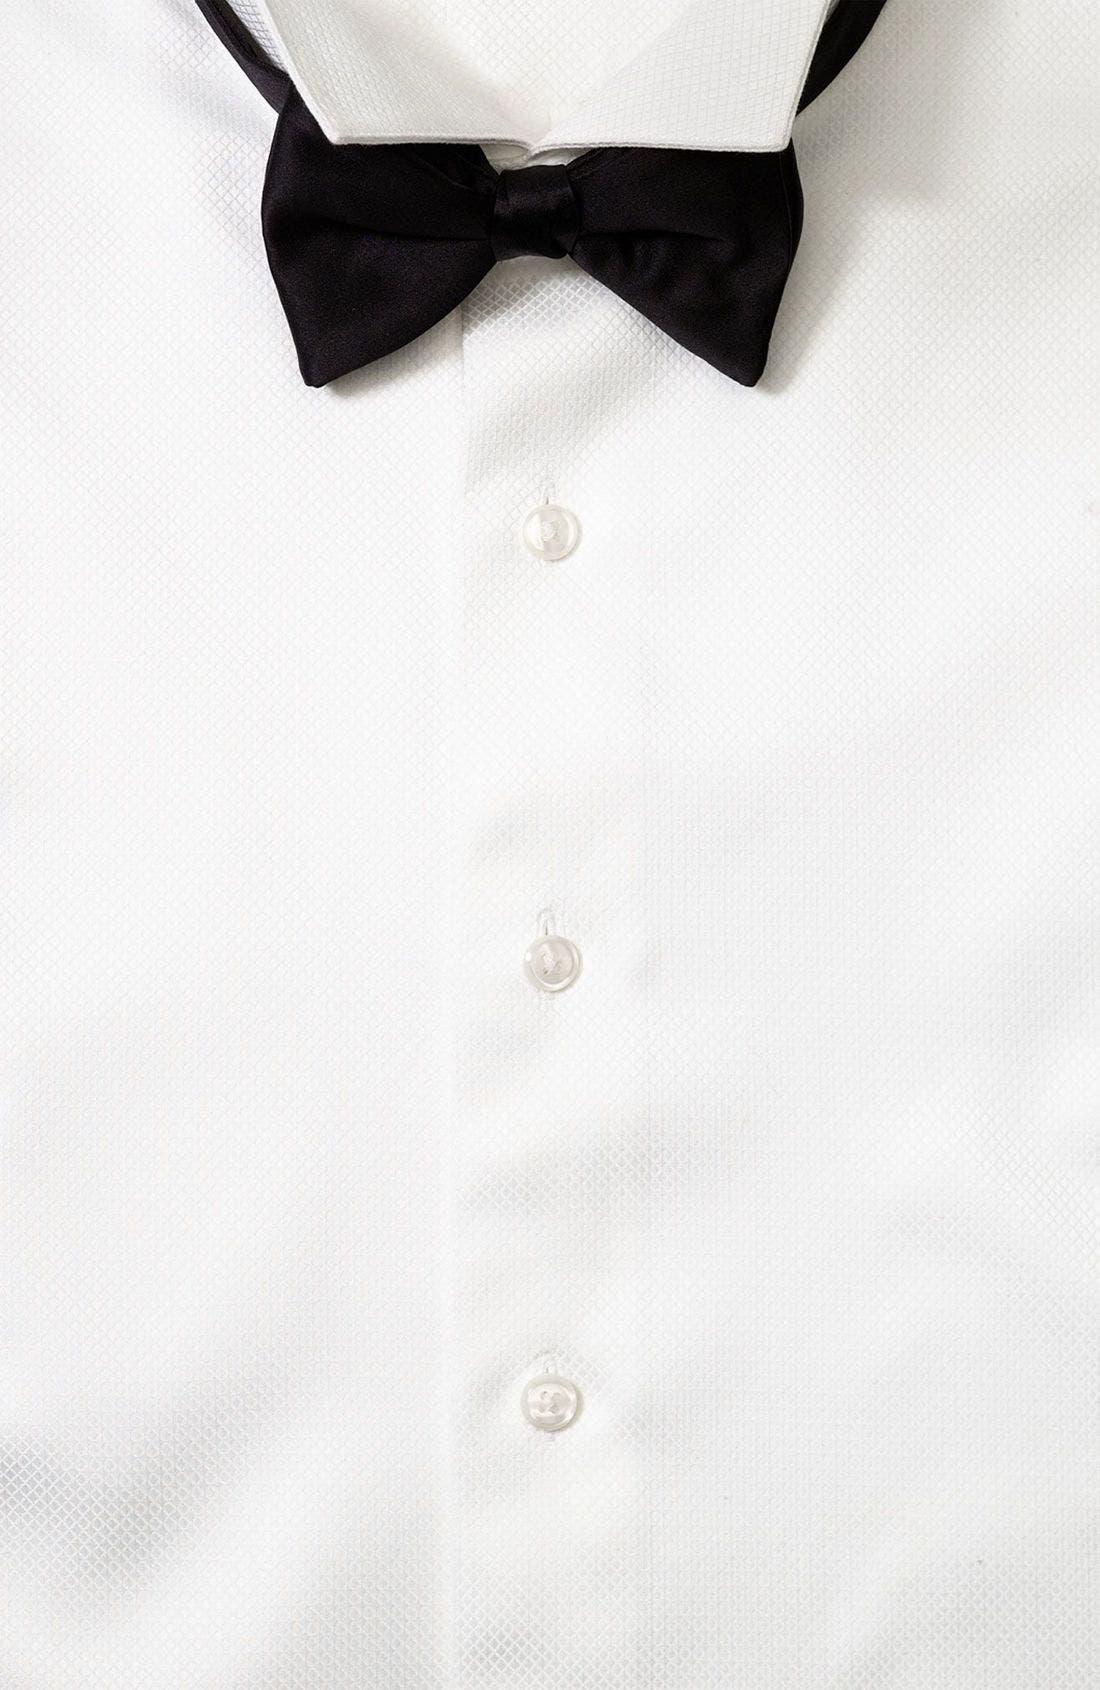 Bow Pre-Tied Tie,                             Alternate thumbnail 3, color,                             BLACK SATIN